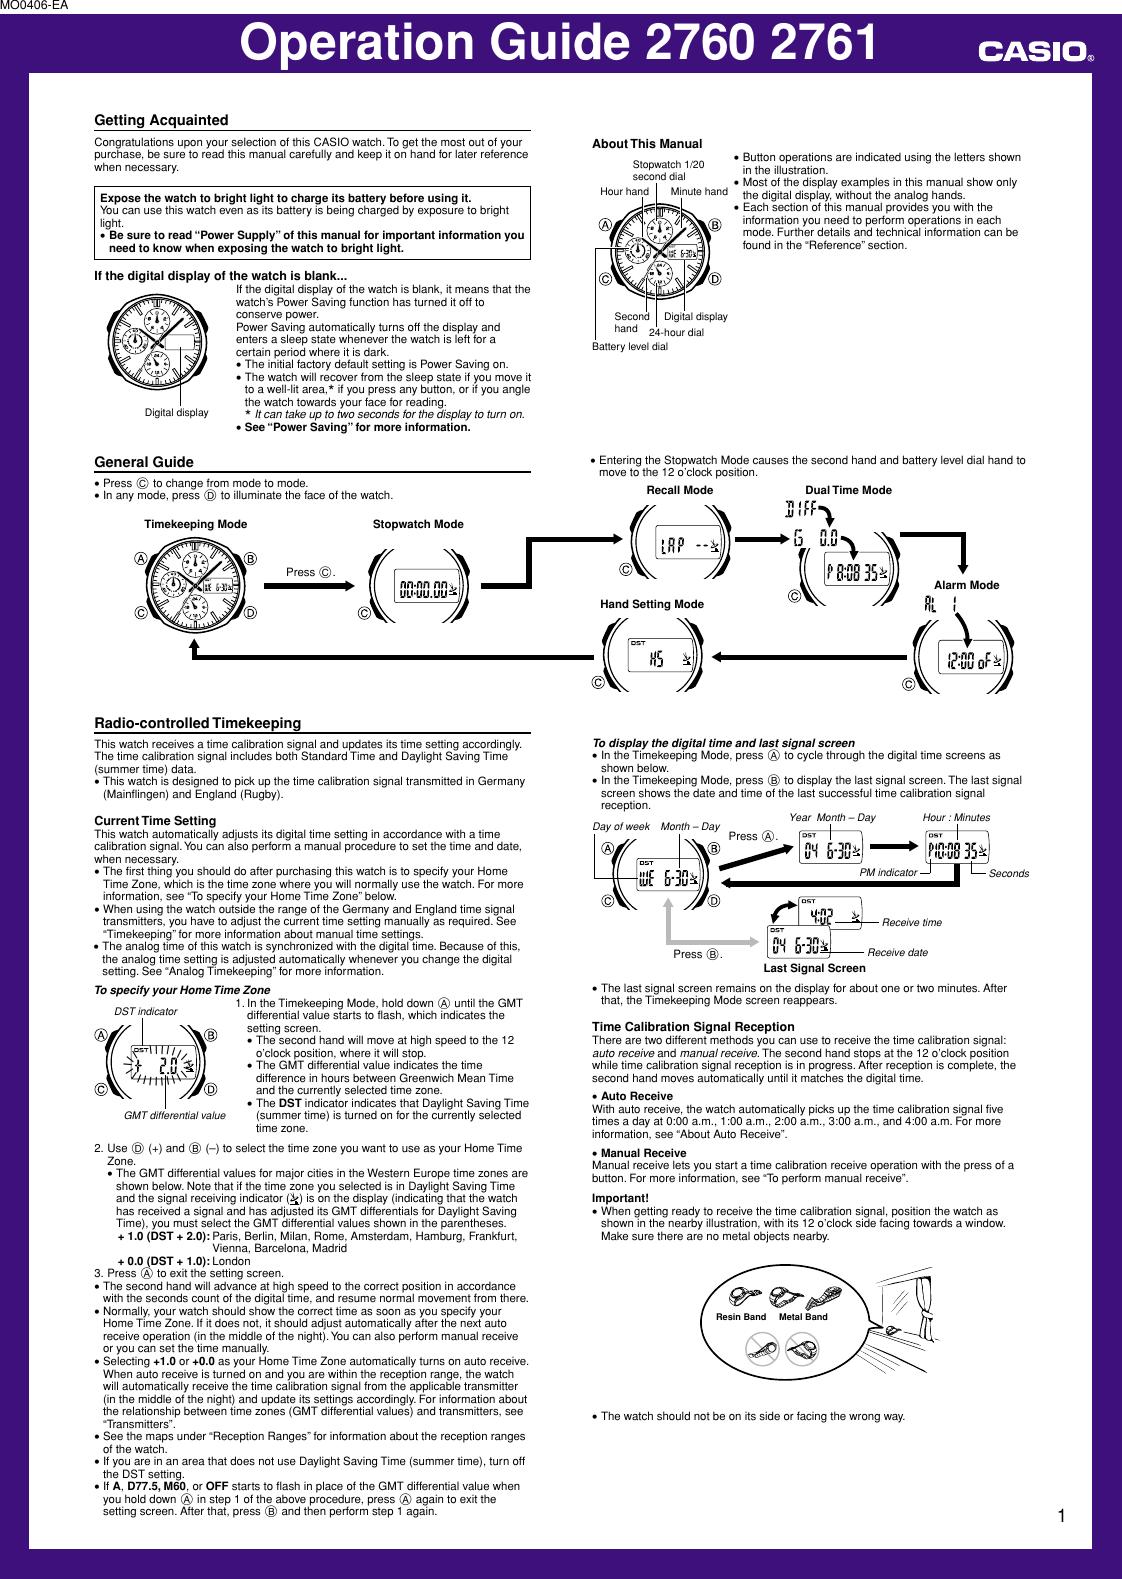 casio 2760 users manual qw 2761 rh usermanual wiki epson 2760 user guide epson 2760 user guide